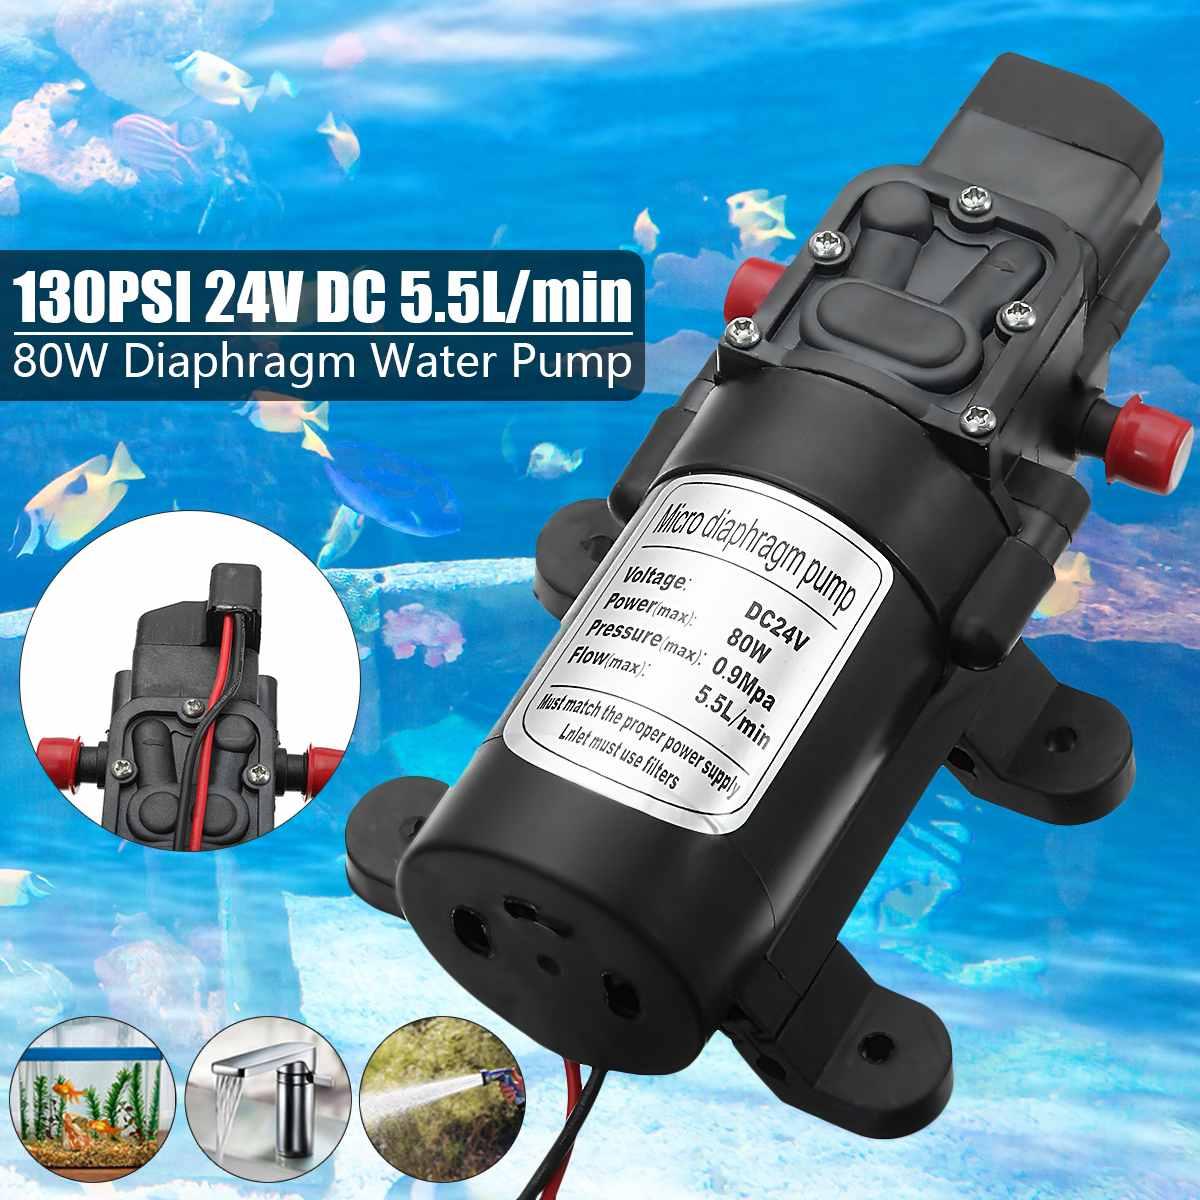 130PSI DC 24V 5.5L/min Agricultural Electric Water Pump Micro High Pressure Micro Diaphragm Water Sprayer Car Wash